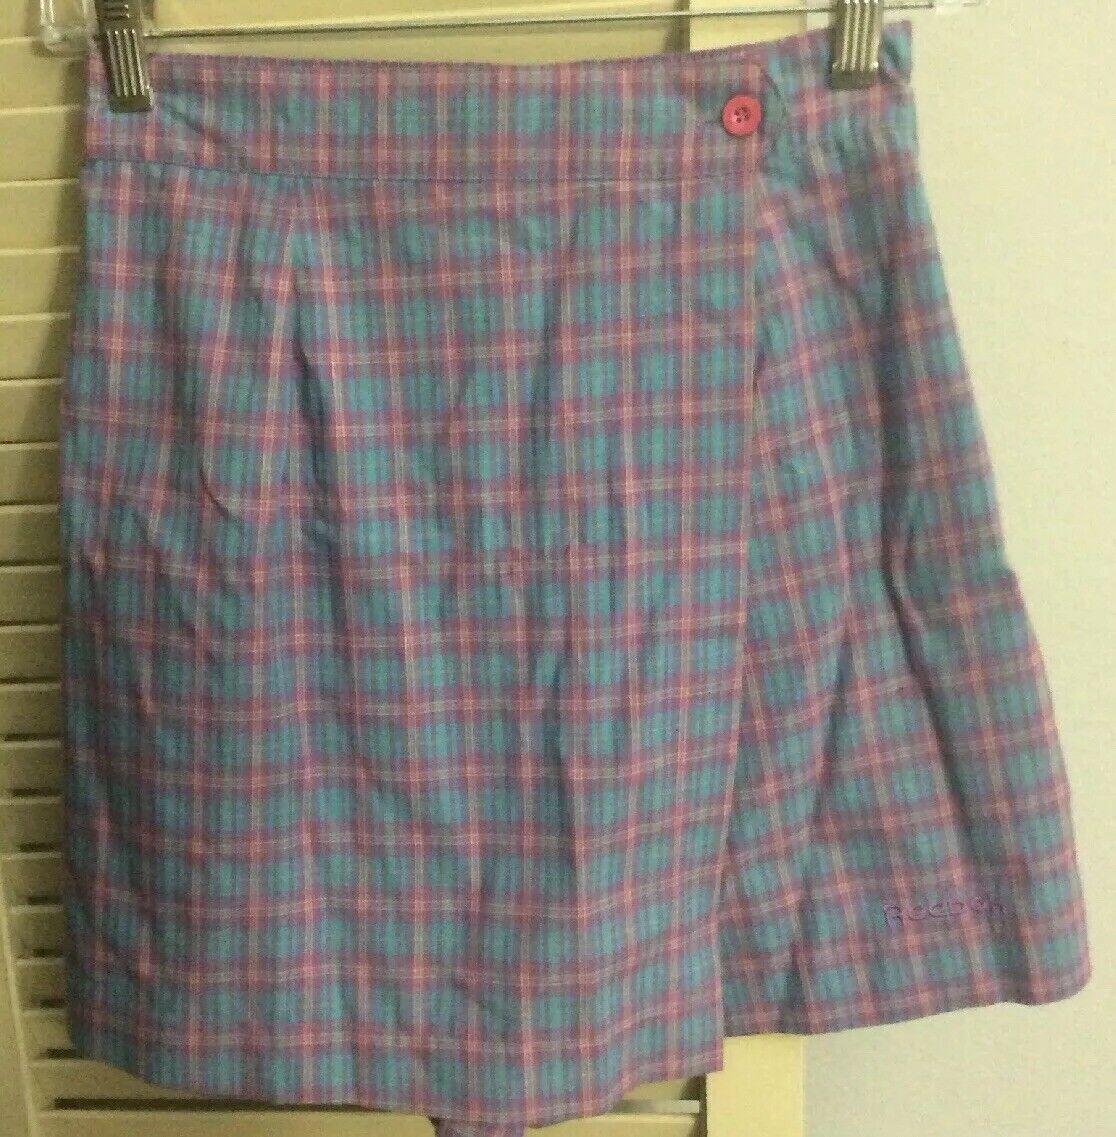 NWT Vtg 80s Reebok Sport Plaid Tennis Shorts SKORT Spell Out Logo Sz S Preppy